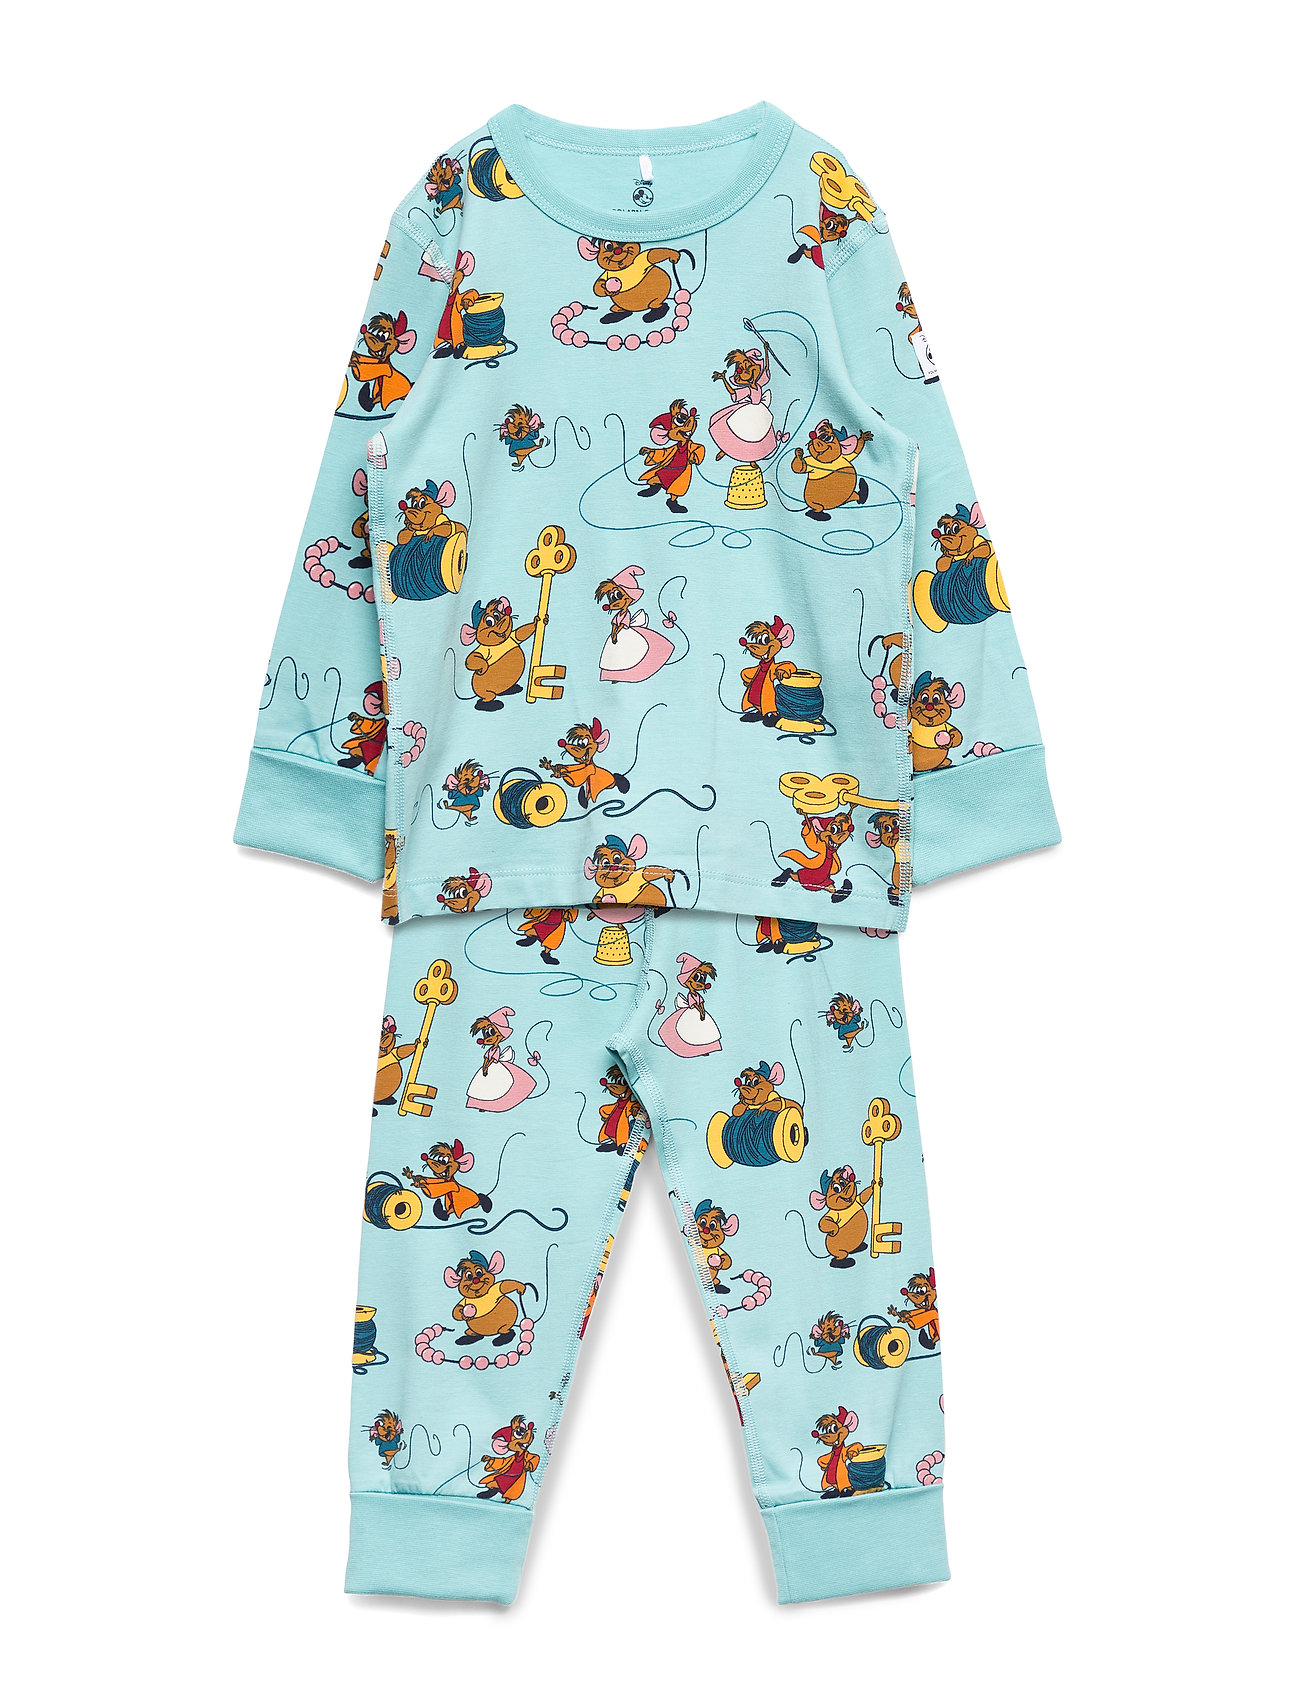 Polarn O. Pyret Pyjamas AOP Preschool - MARINE BLUE